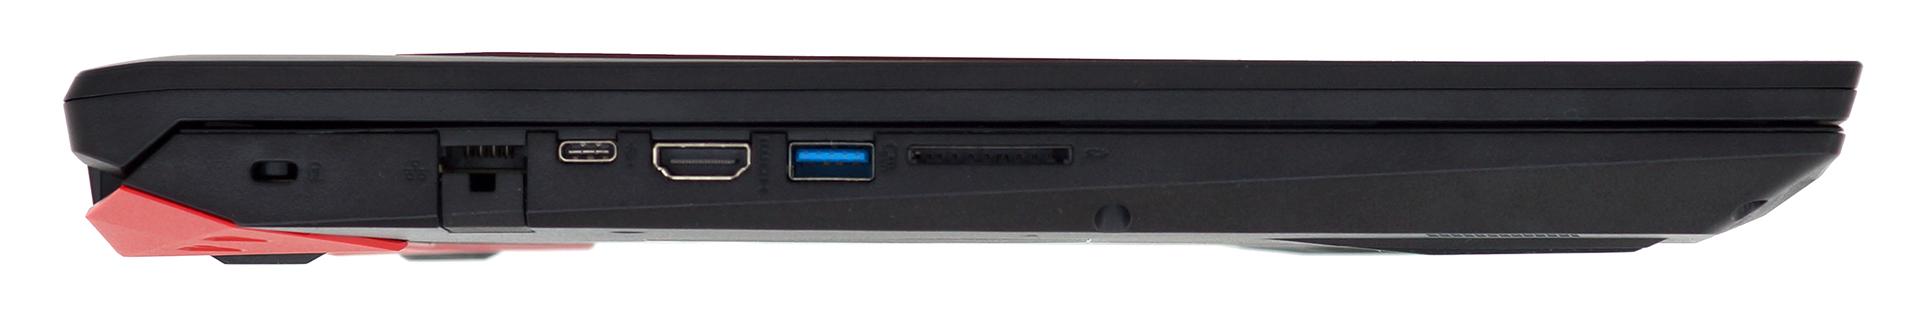 Acer Predator Helios 300 (17-inch, PH317-51/52) review